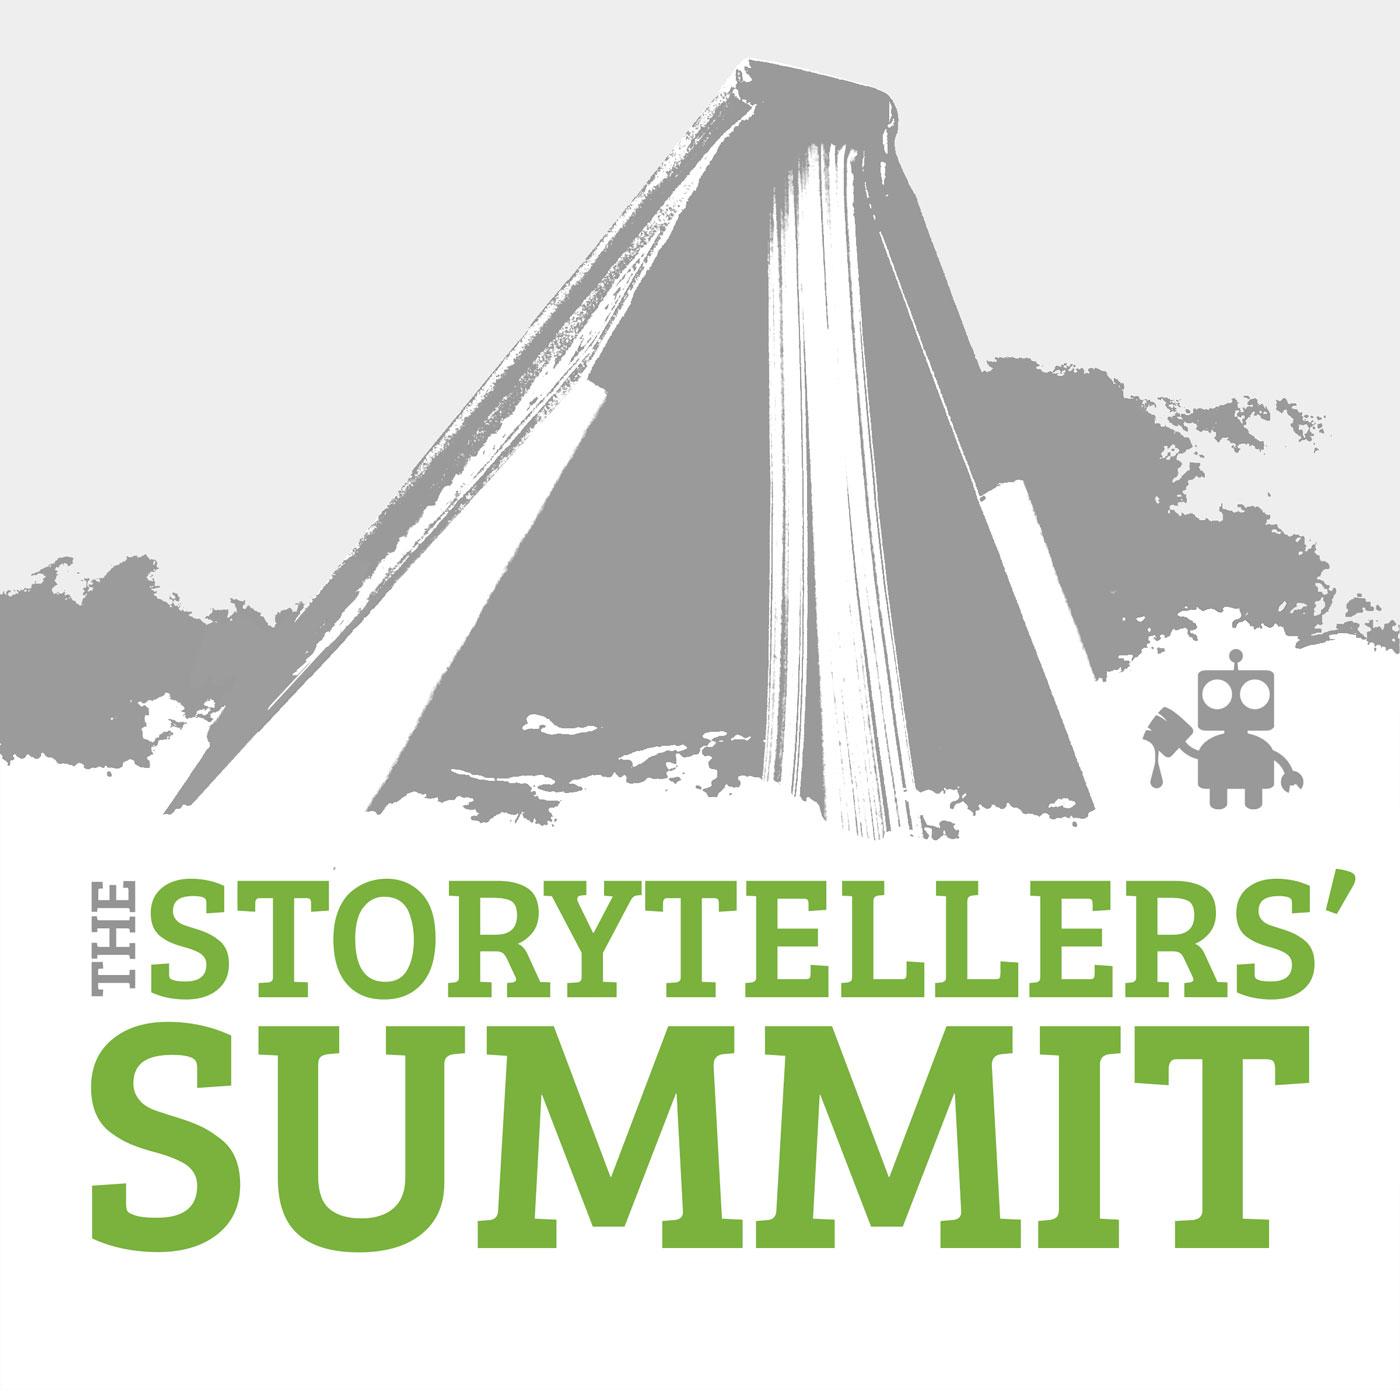 StorytellersSummitArt_HighQ_1400w